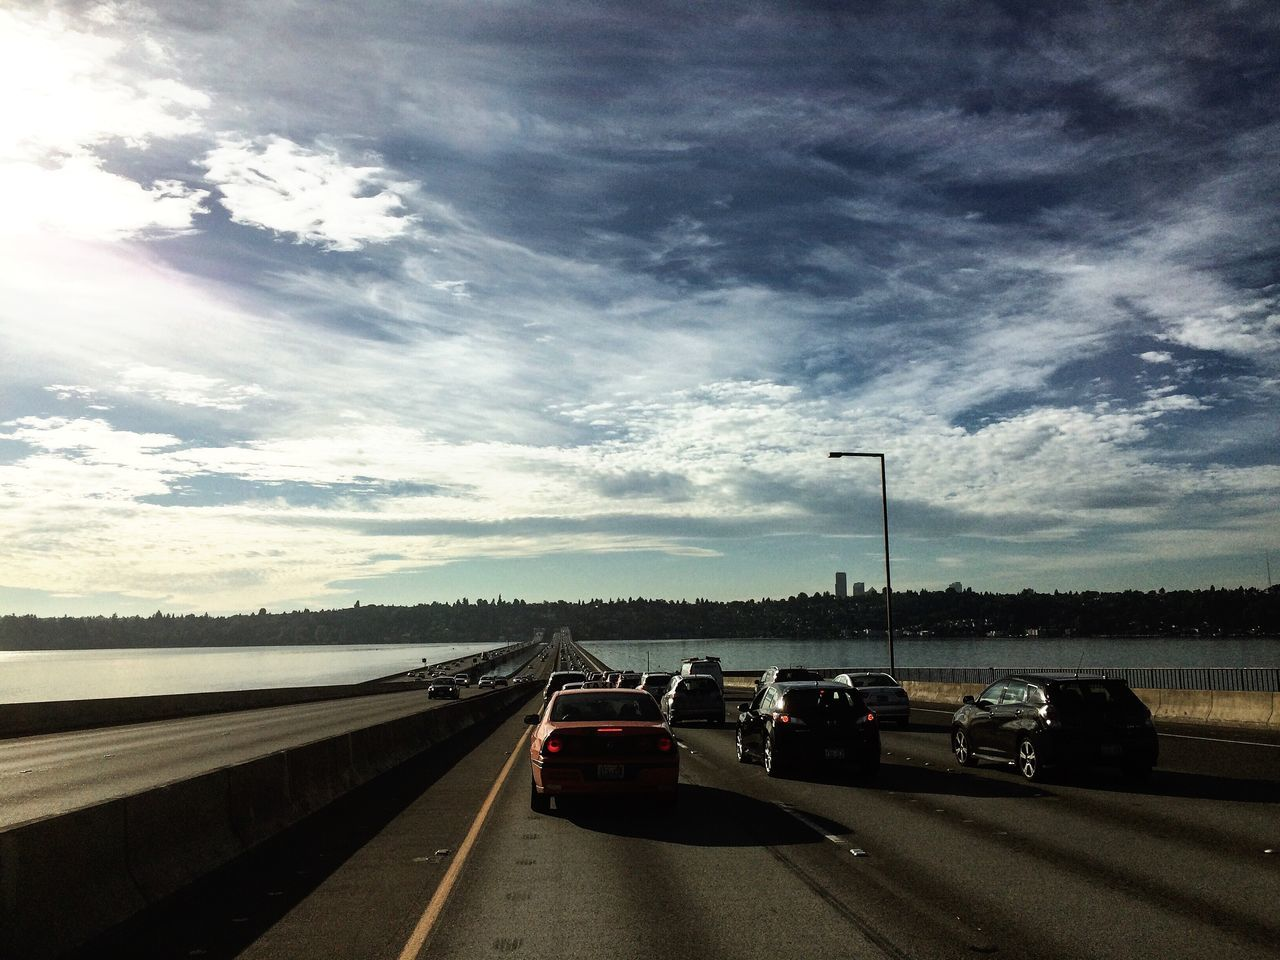 scenic traffic